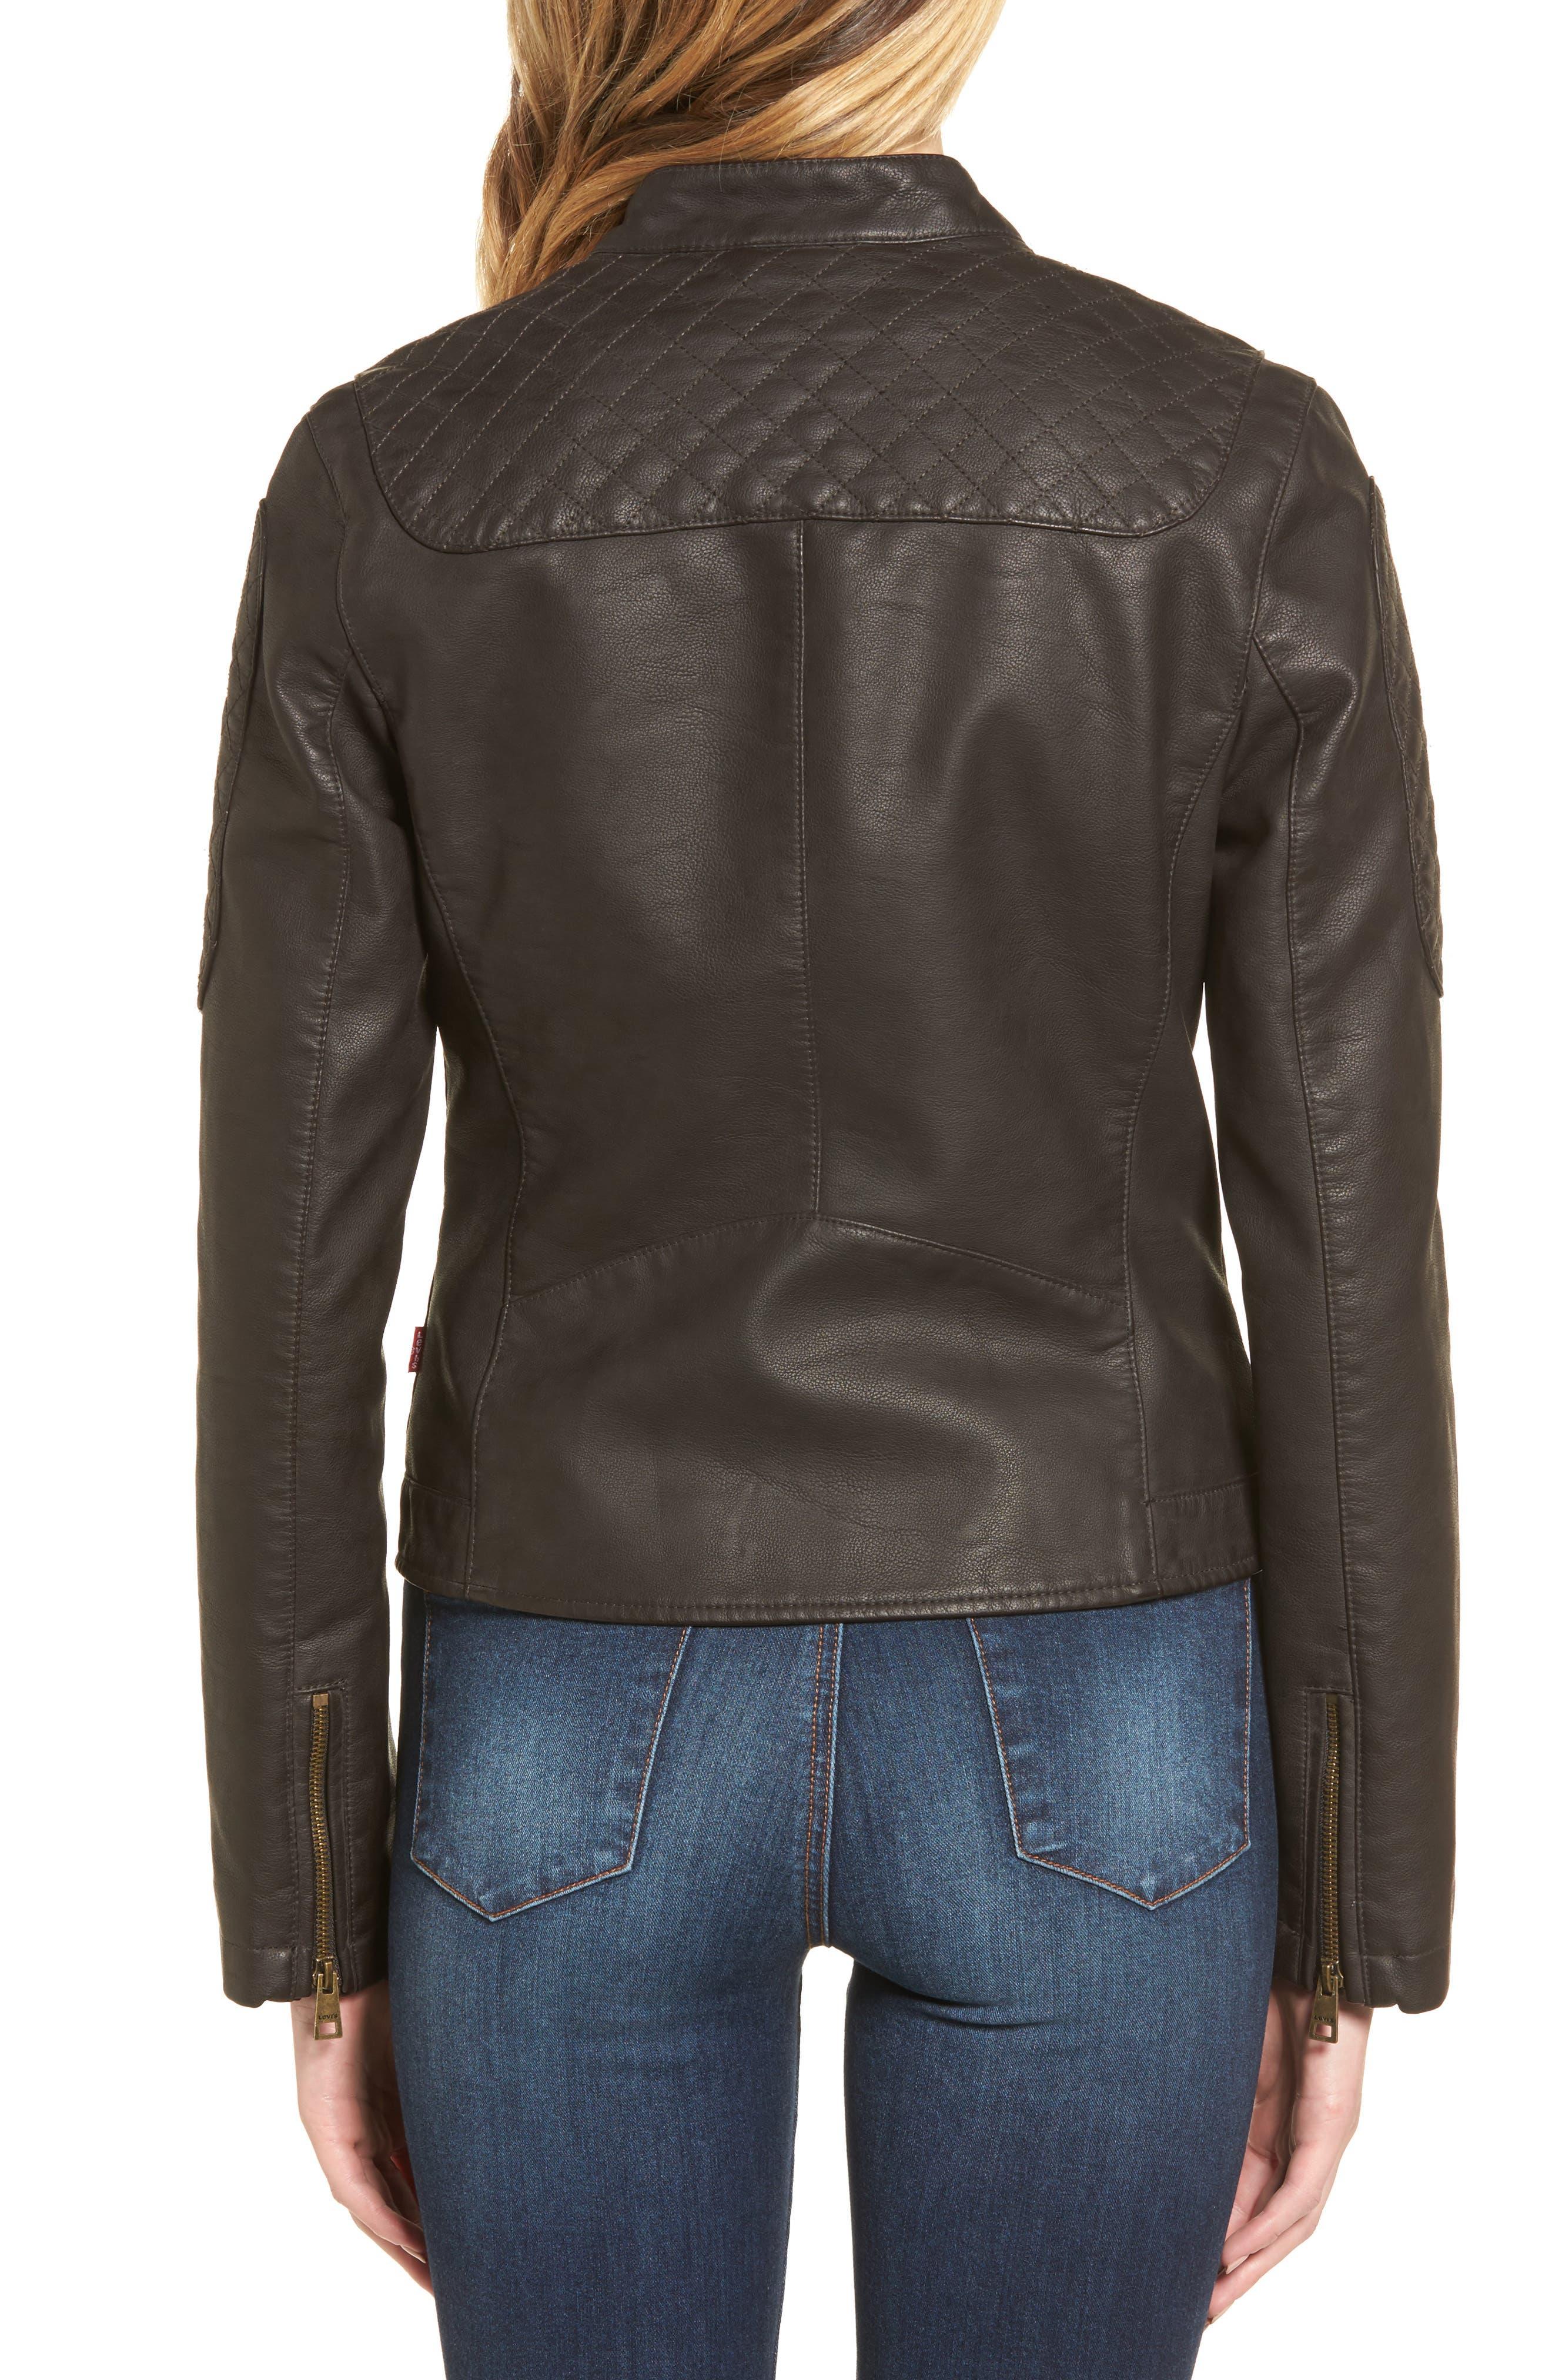 LEVIS<sup>®</sup> Faux Leather Moto Jacket,                             Alternate thumbnail 2, color,                             Brown